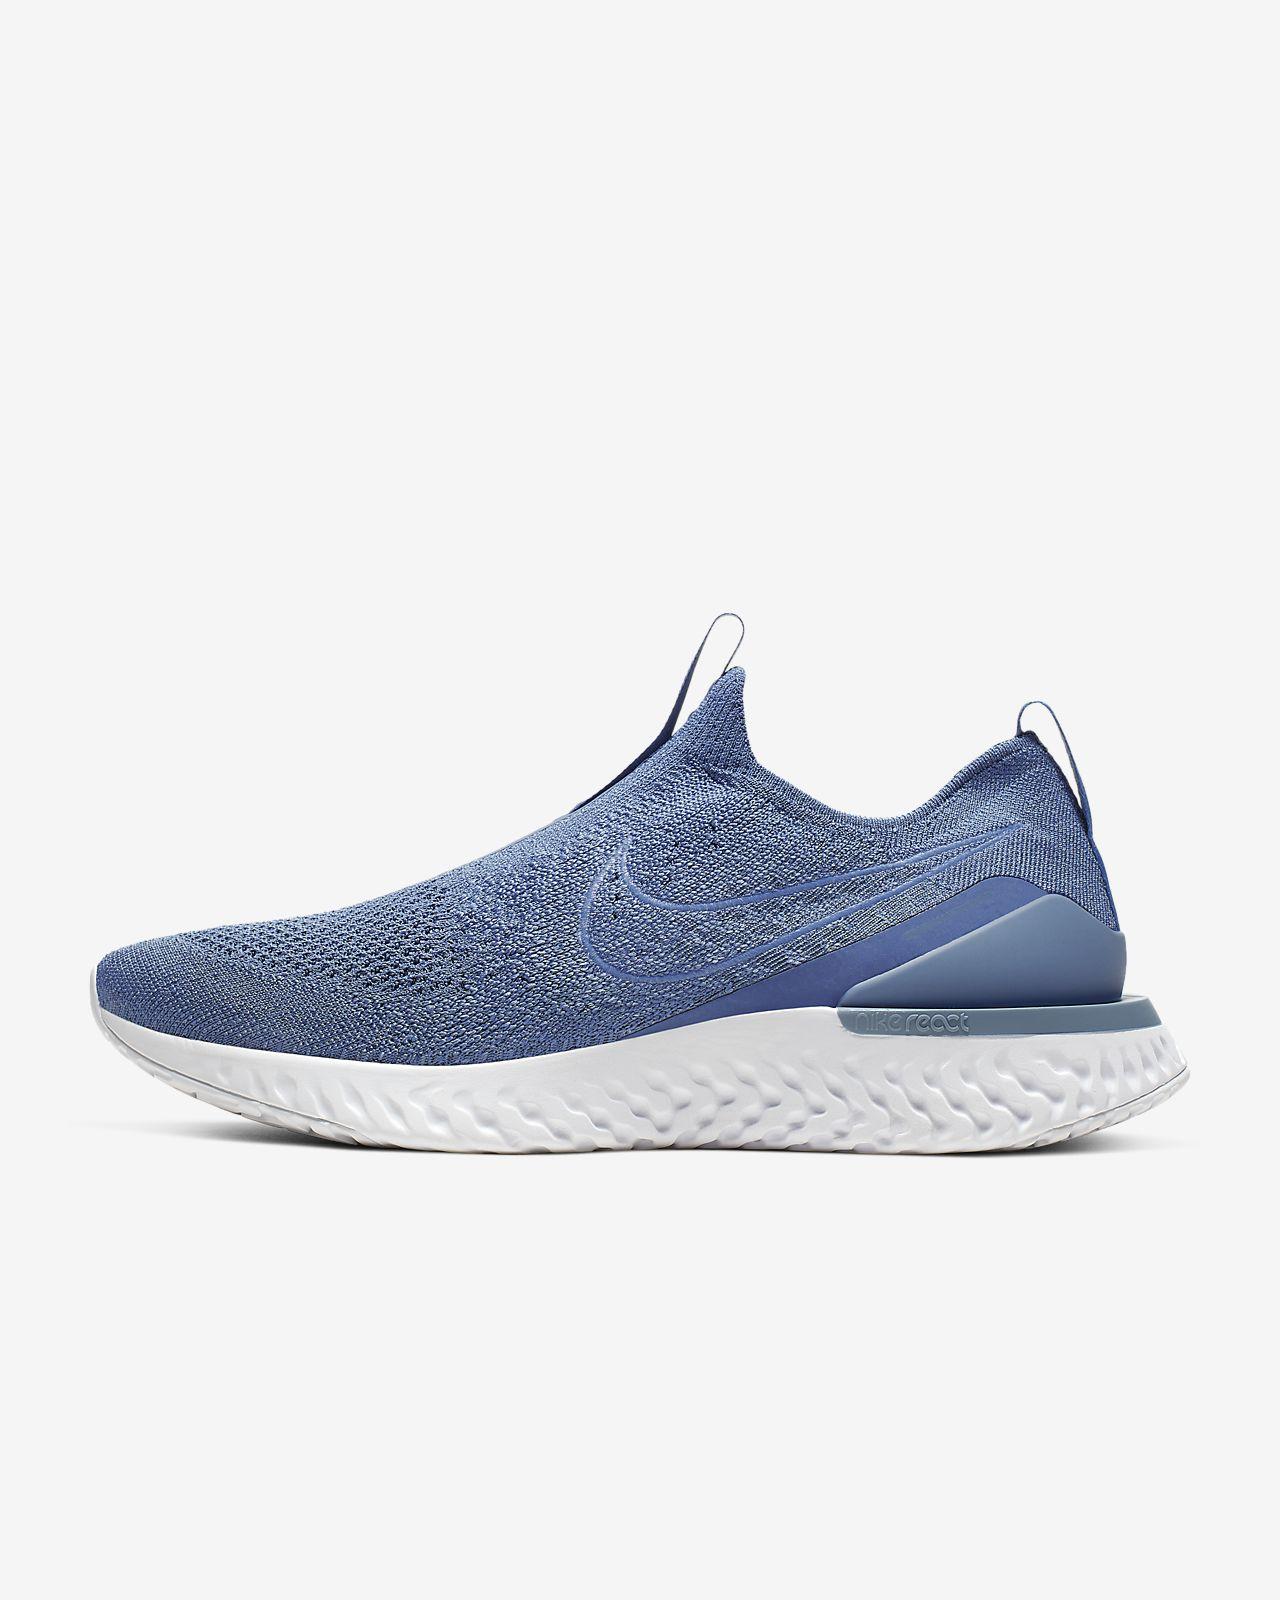 23081c3c0047e Nike Epic Phantom React Flyknit Men's Running Shoe